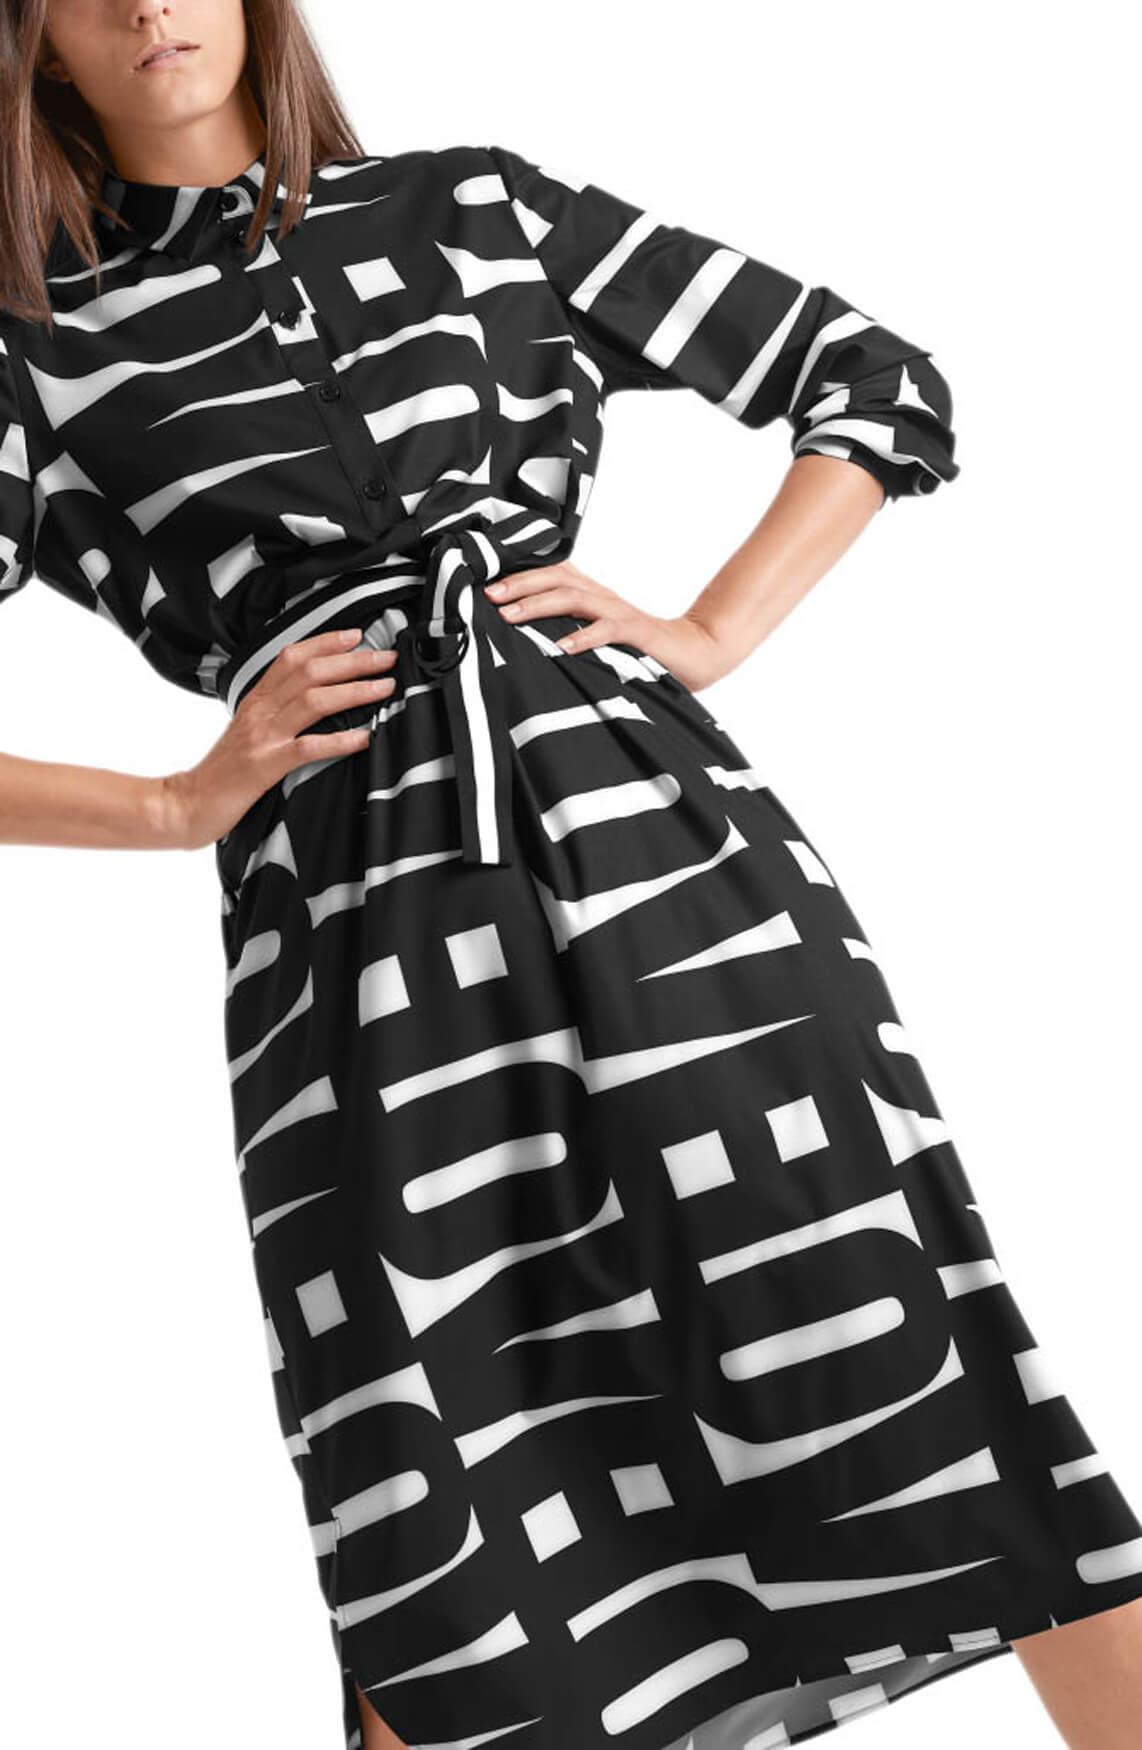 Marccain Sports Dames Love letter jurk Zwart